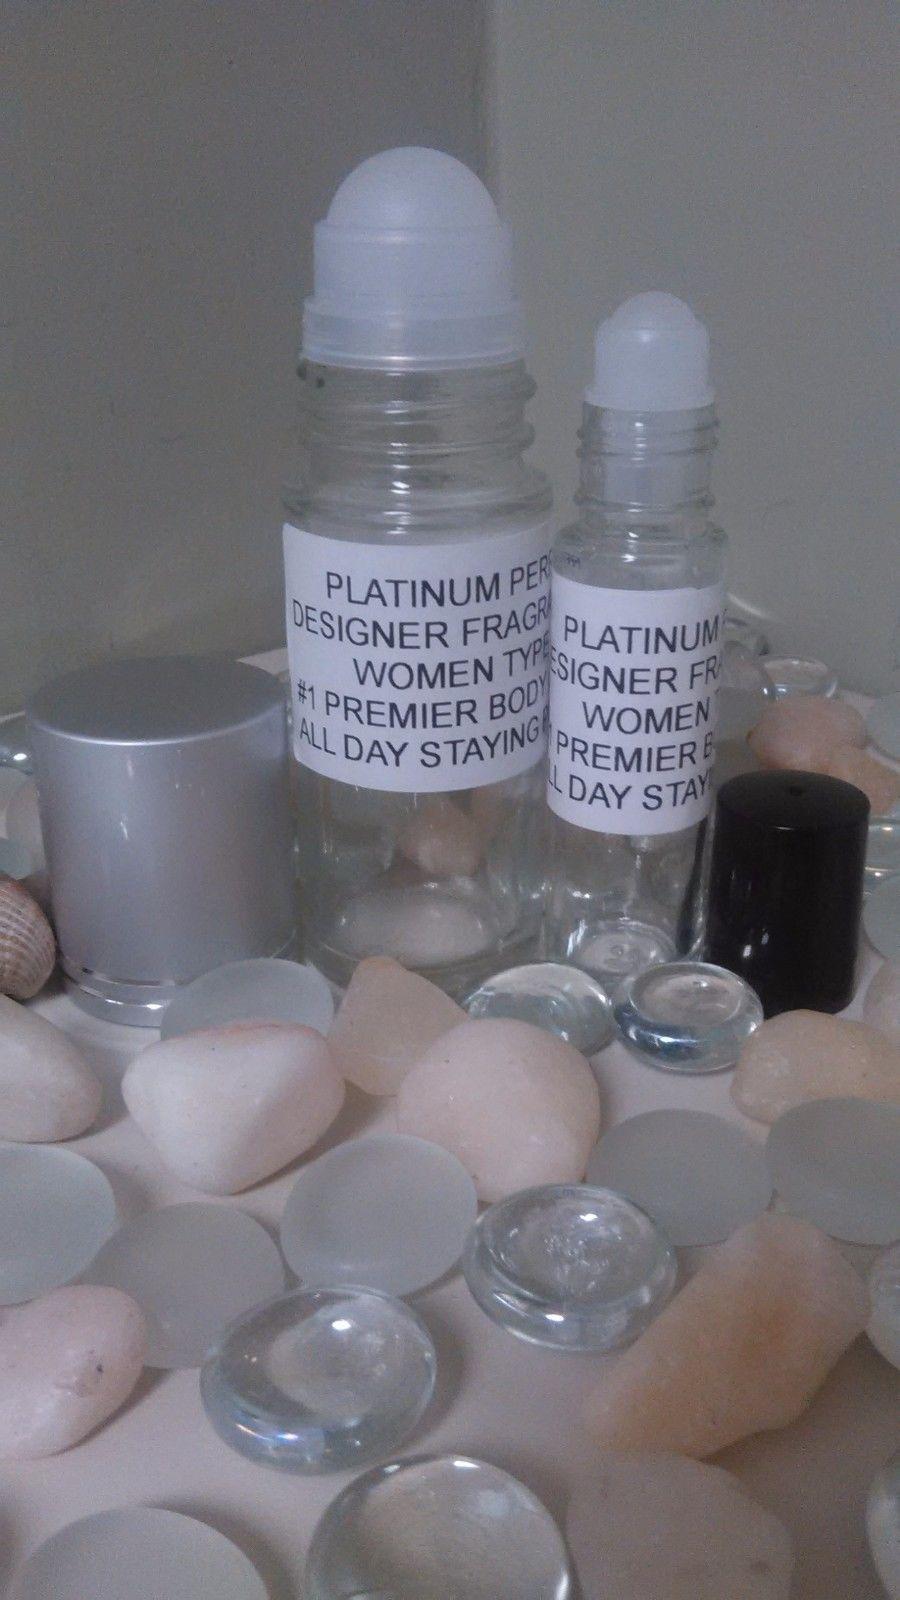 Platinum Perfume & Cologne Types